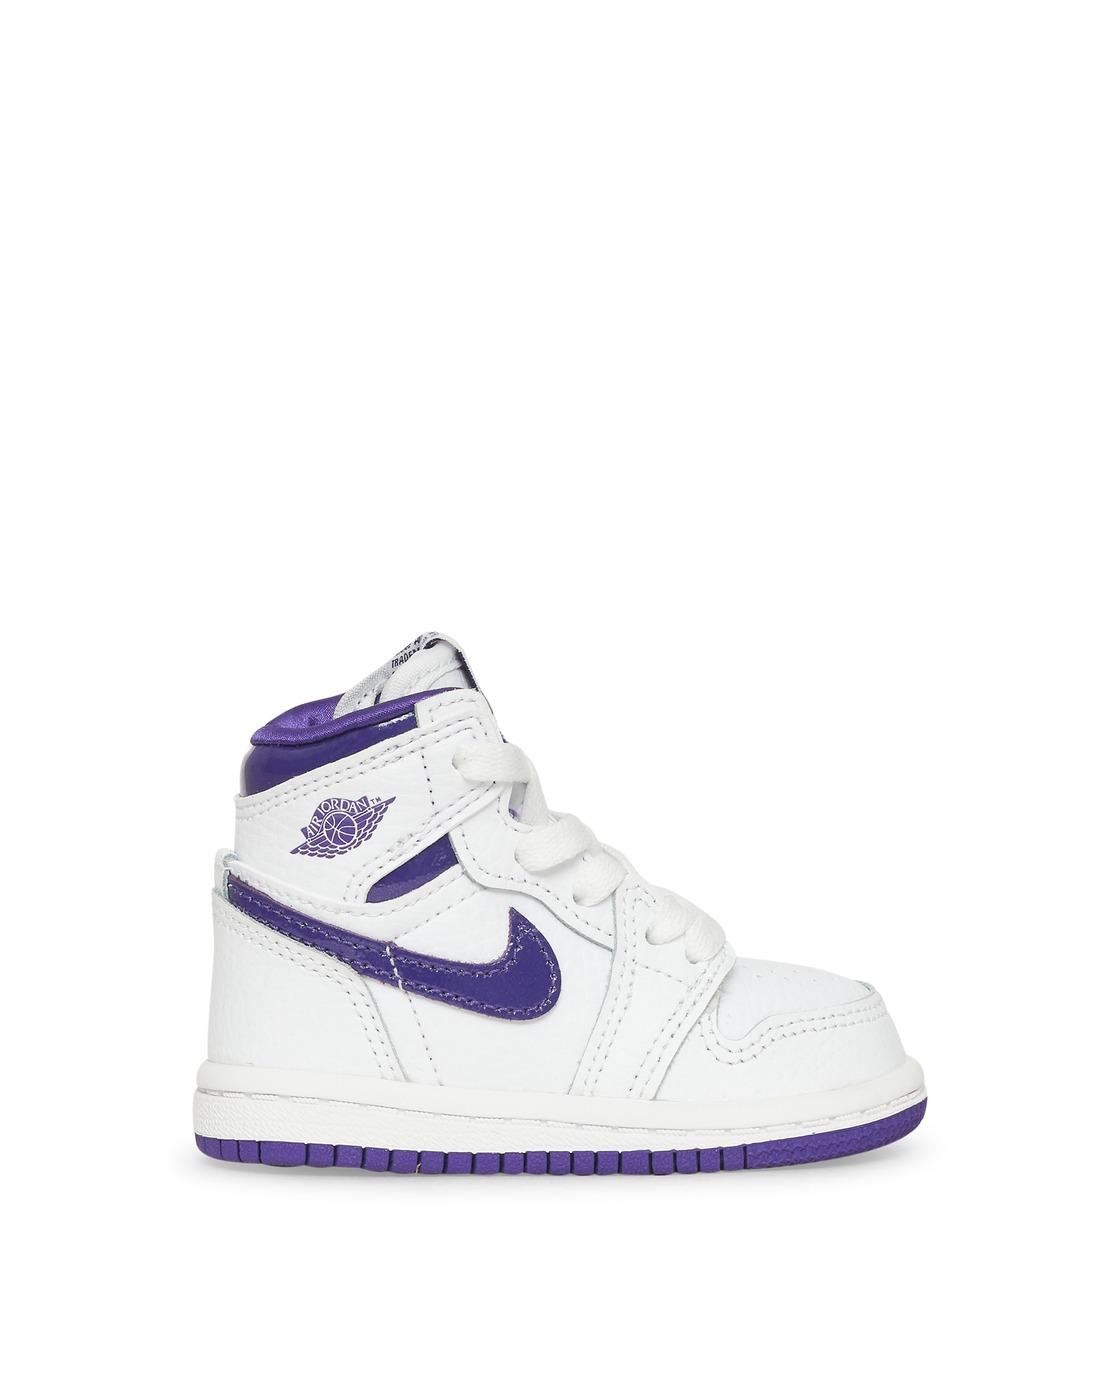 Photo: Nike Jordan Air Jordan 1 Retro Hi Og Td Sneakers White/Court Purple